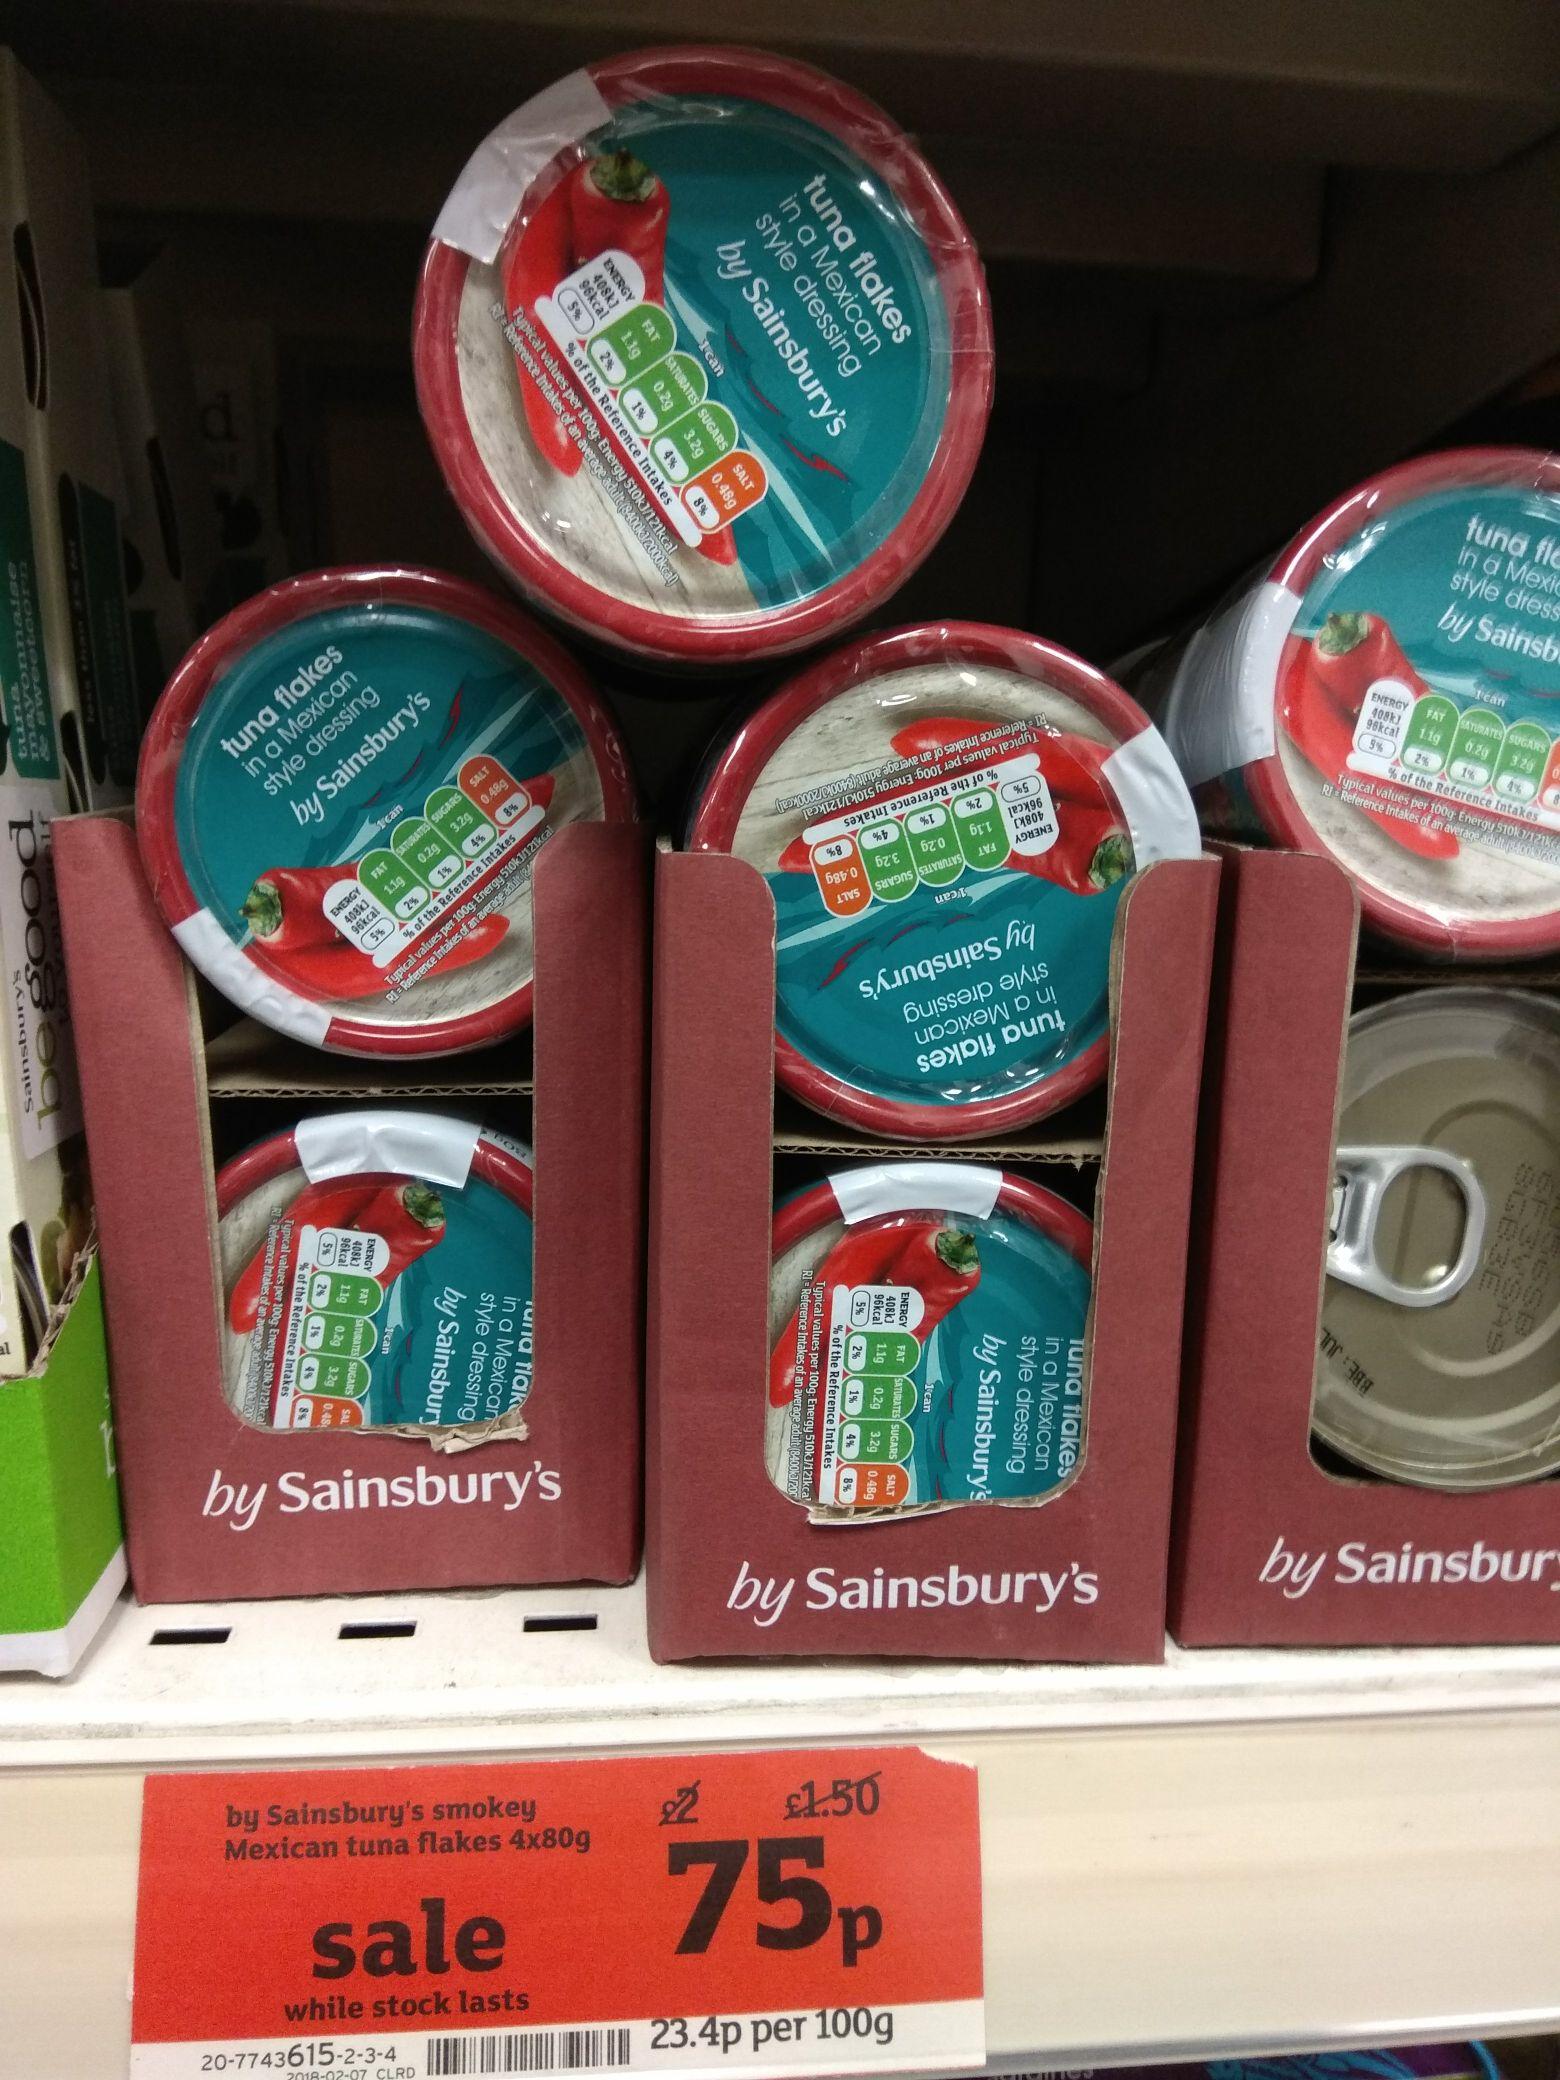 Sainsbury's smokey mexican tuna flakes 4 x 80g - 75p instore